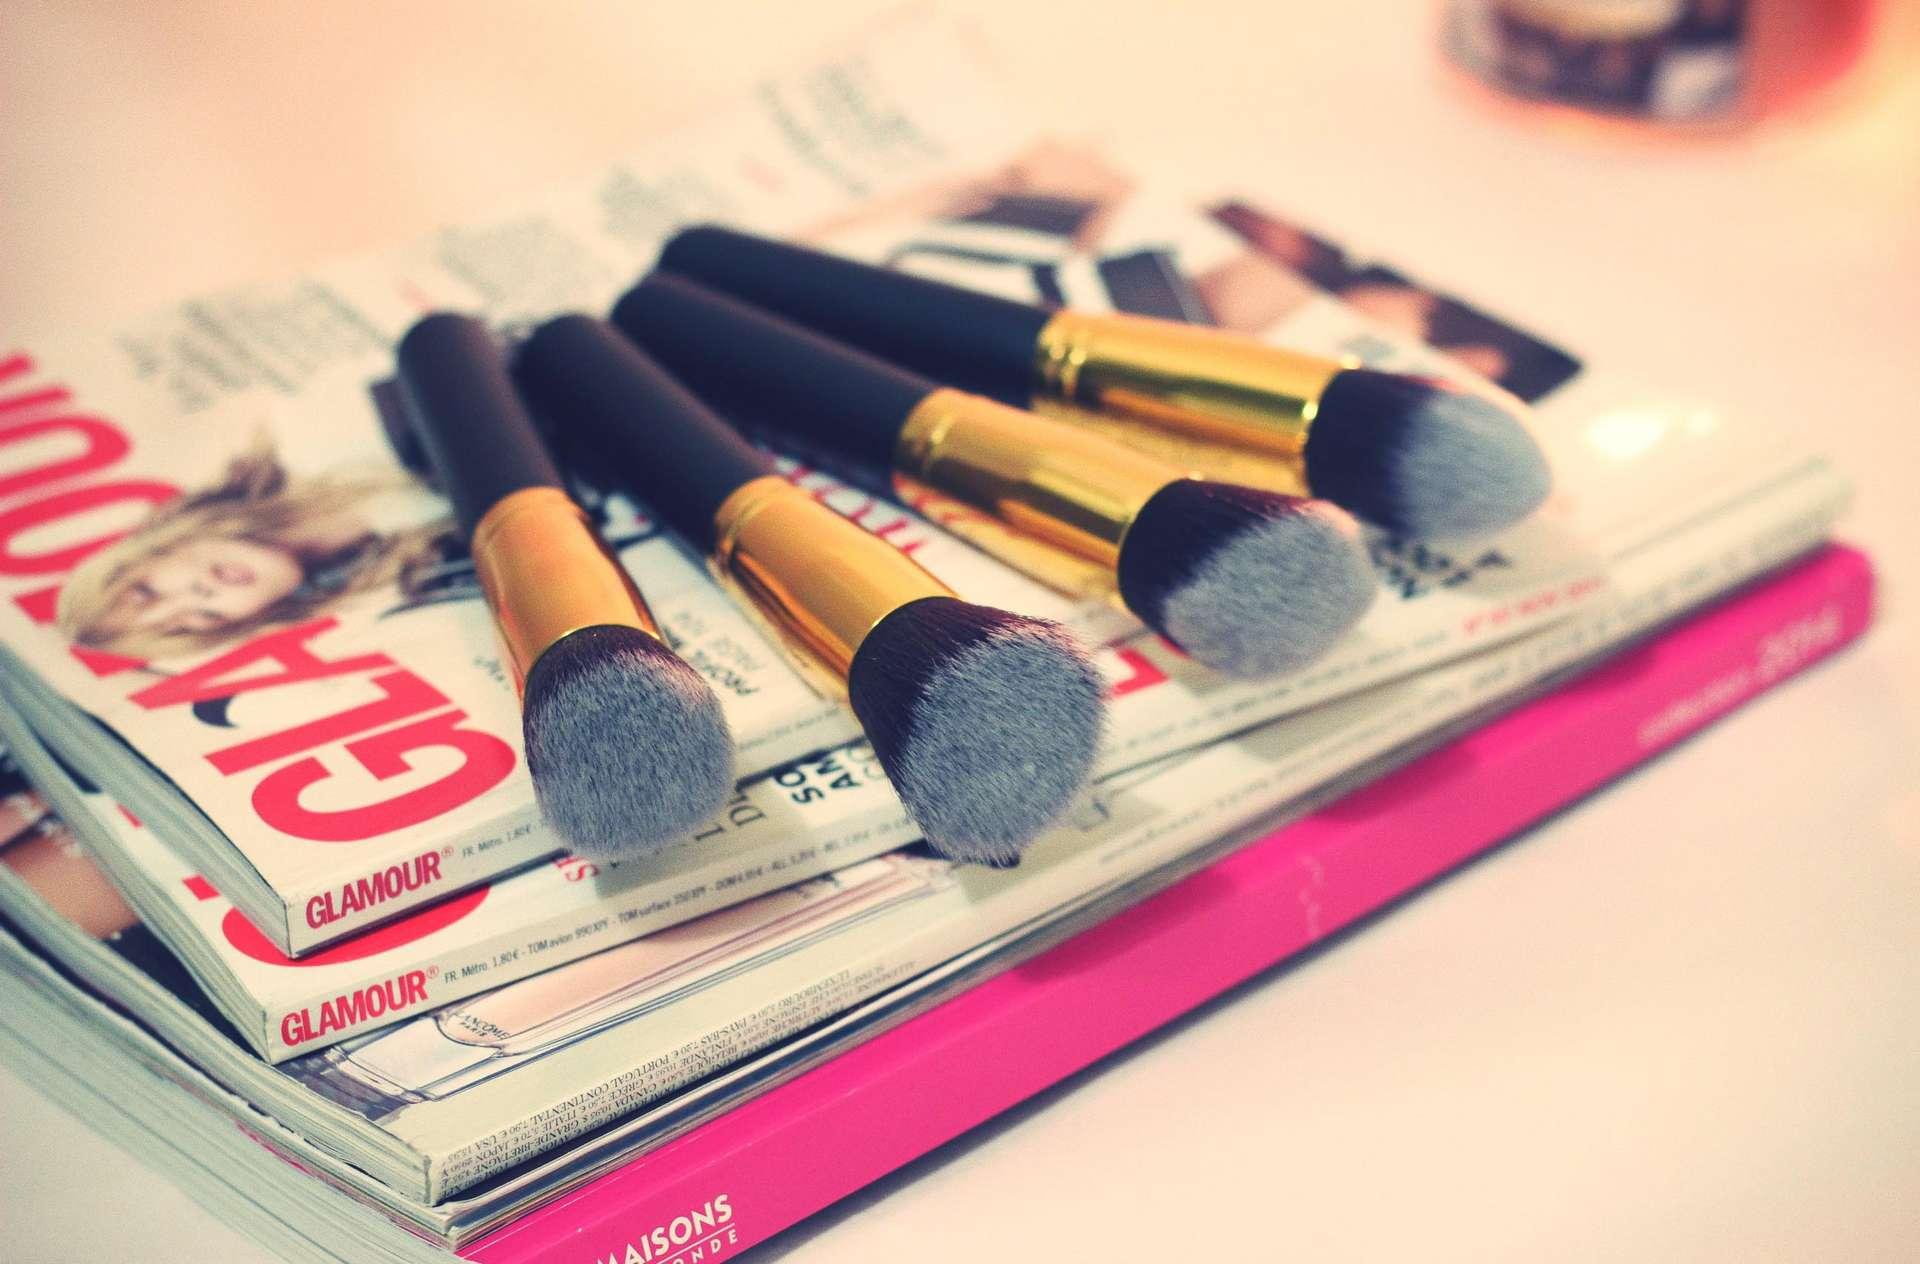 Make-up-brushes-facebrushes-eyebrushes-beauty-blackbeautyblogger-ctbb3